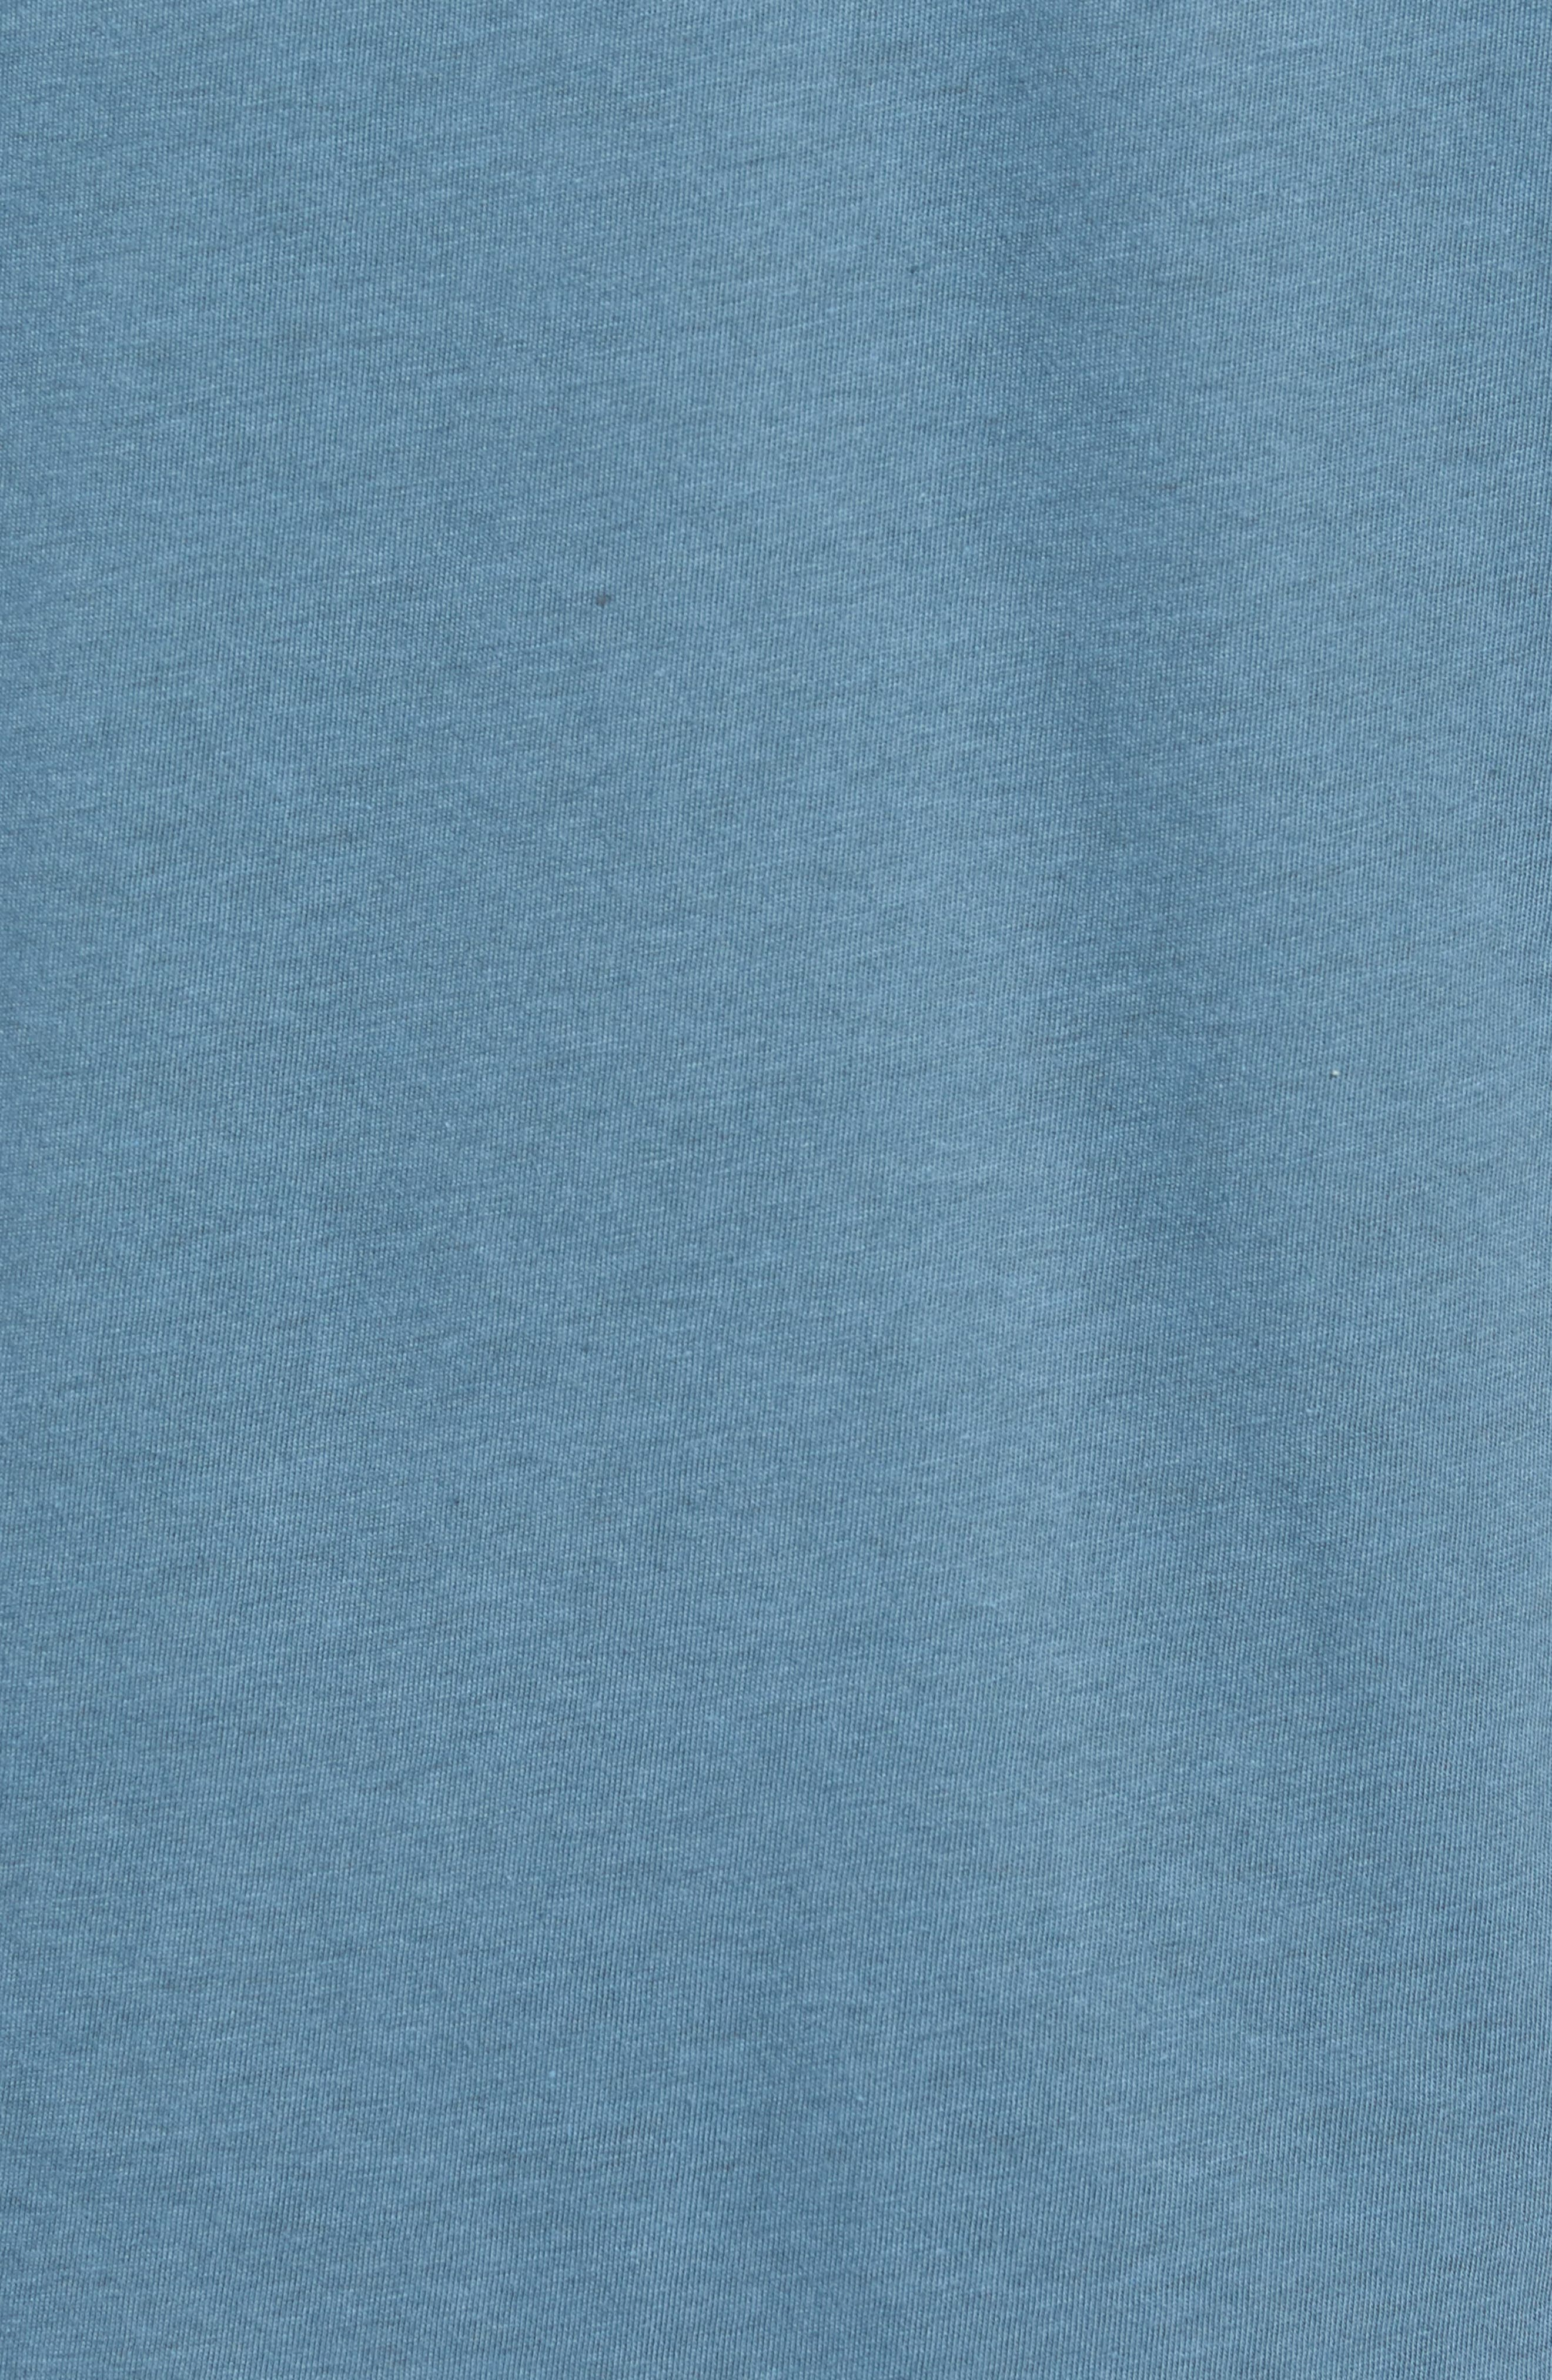 Bard Pocket Cotton Blend T-Shirt,                             Alternate thumbnail 3, color,                             Indigo